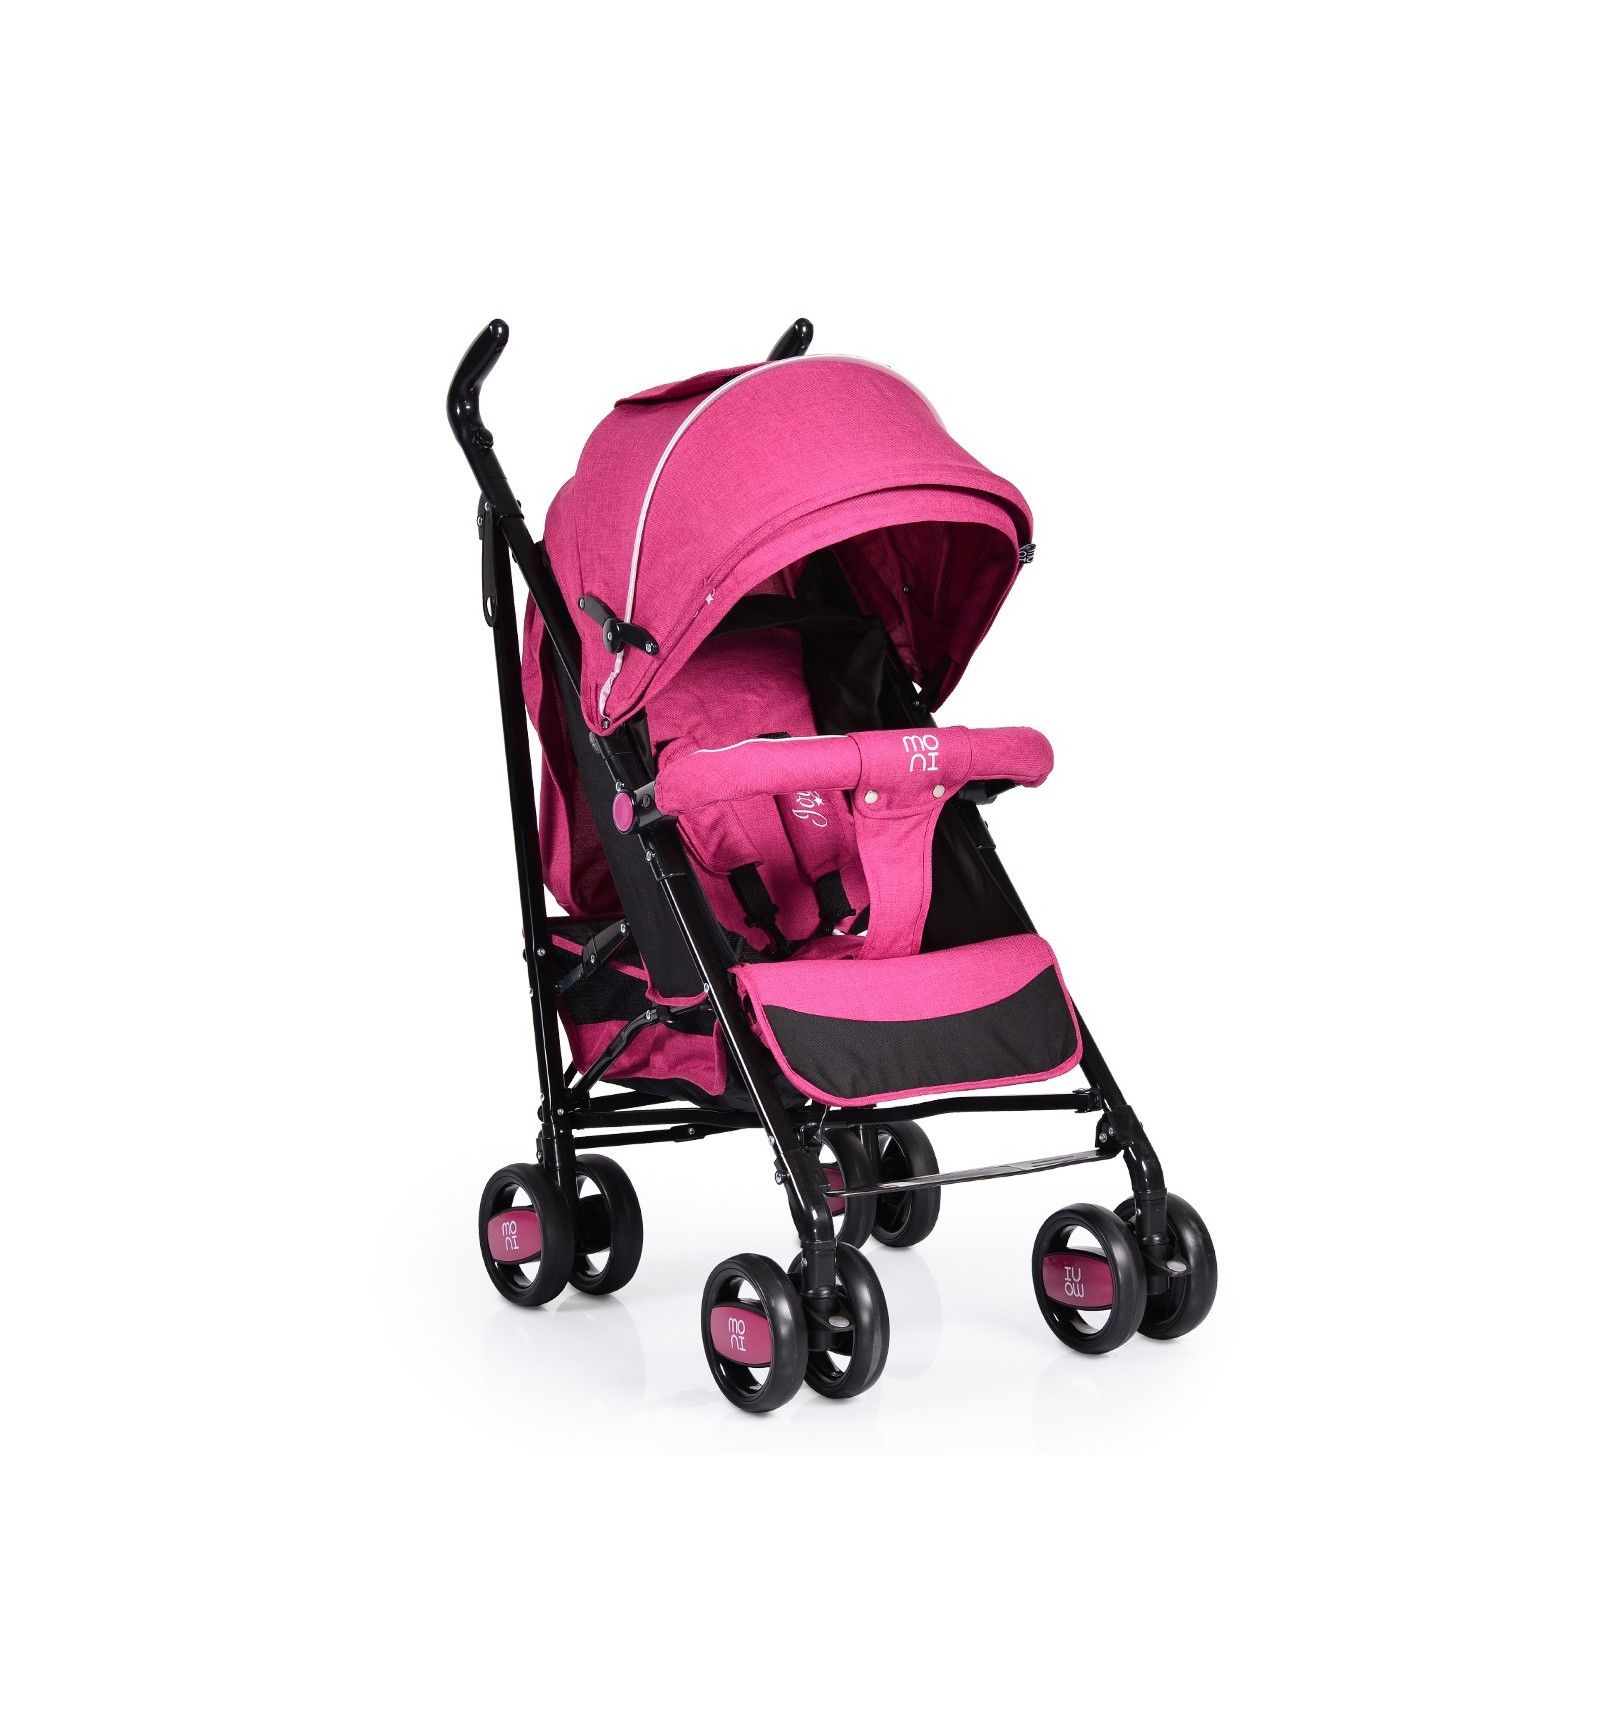 Baby stroller Joy Mari Kali Babies Perfect decent price